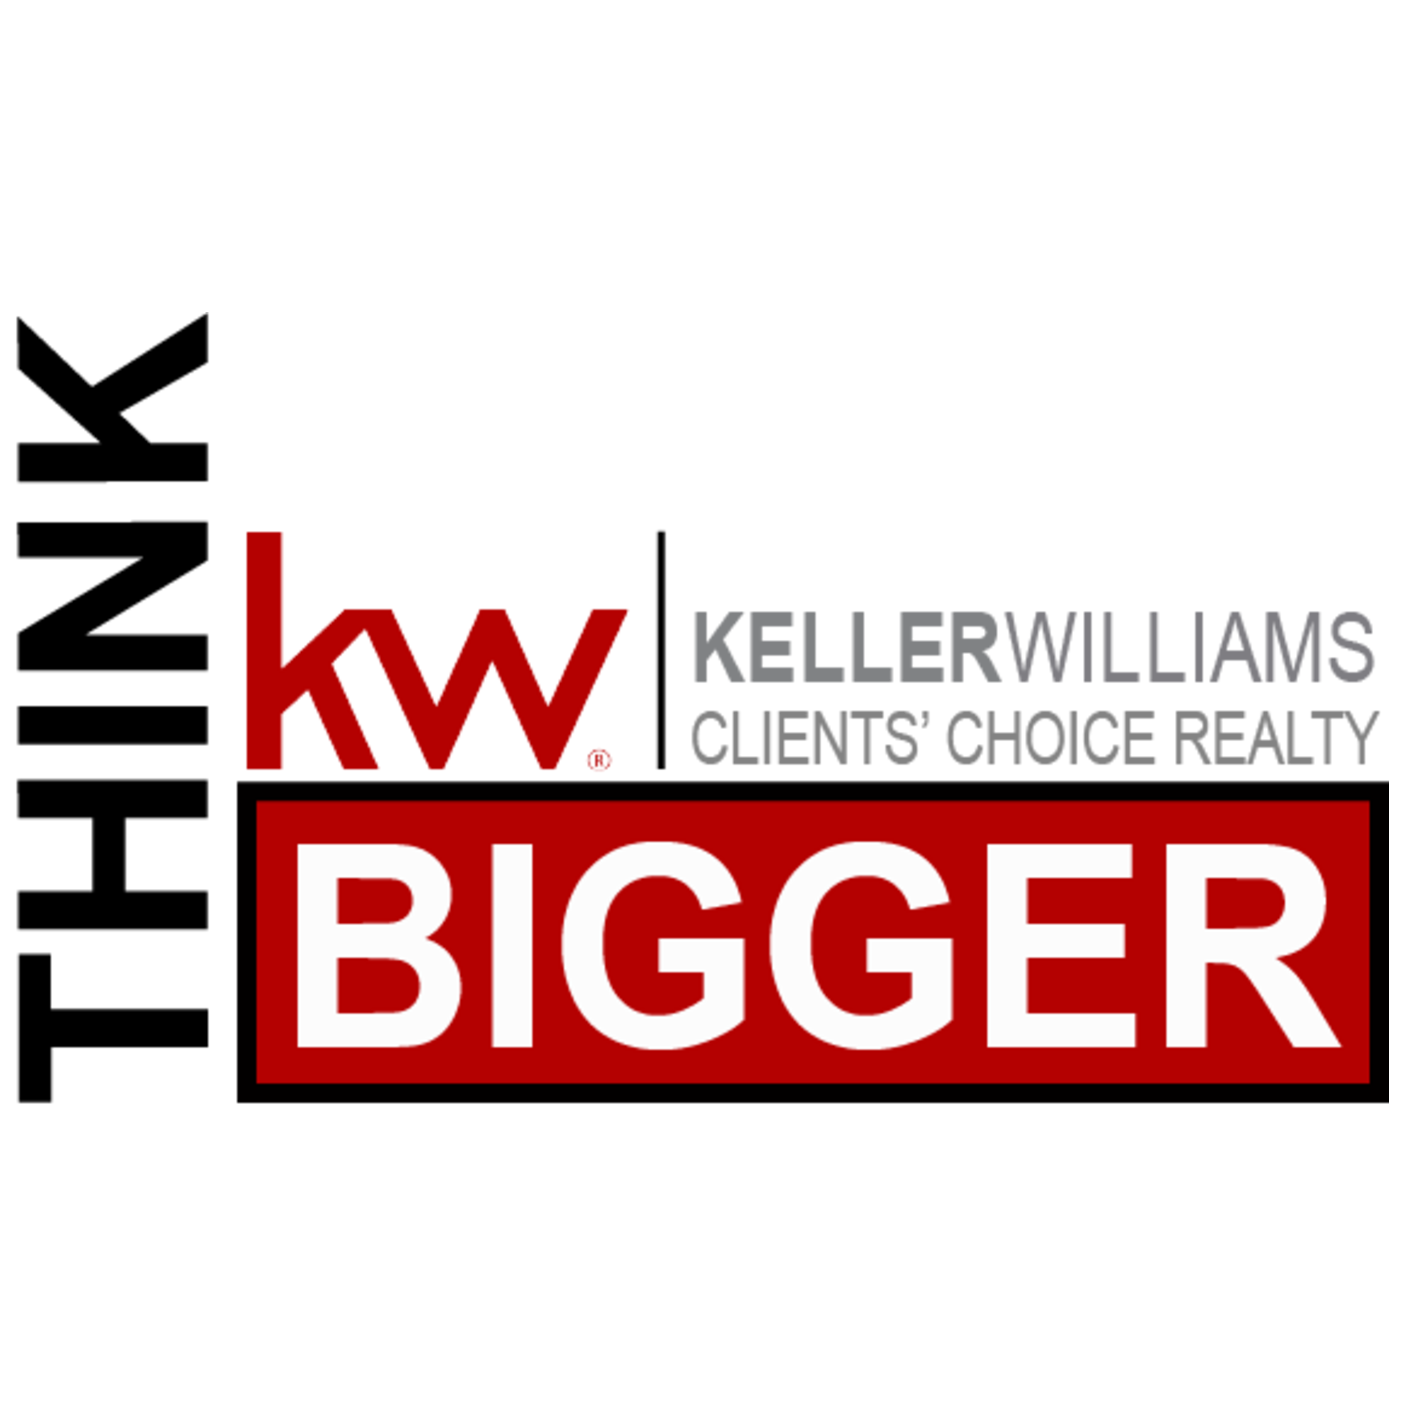 Kim Kentera - Keller Williams Clients' Choice Realty